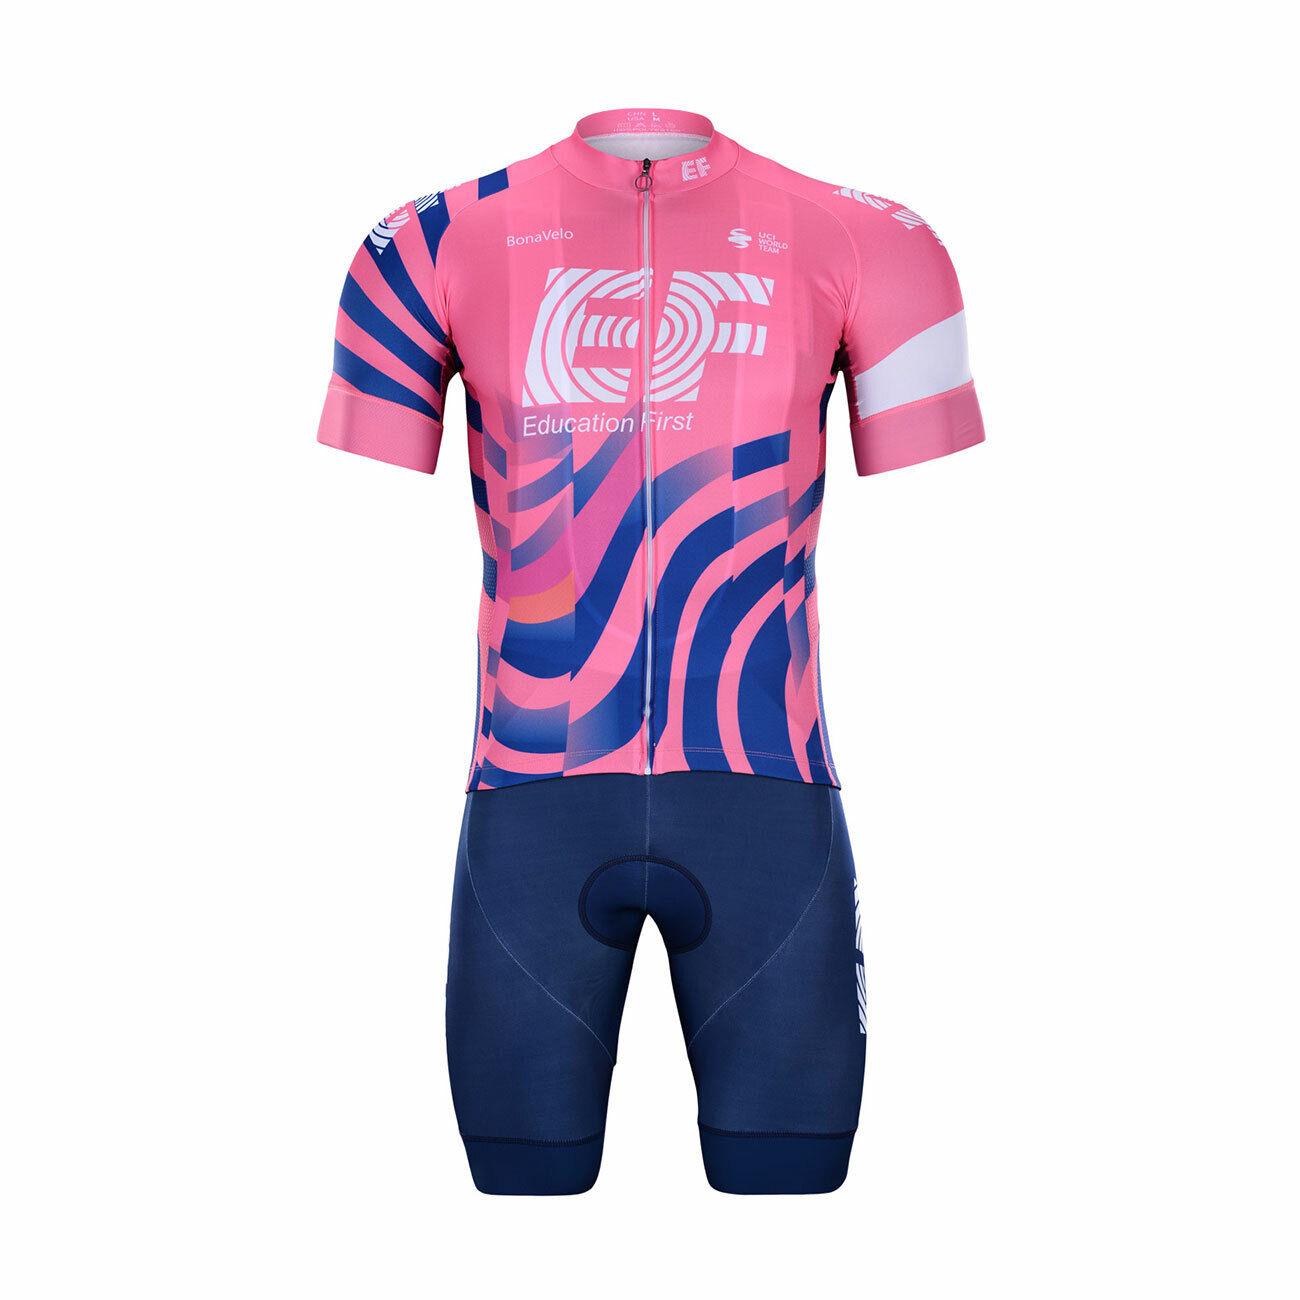 Jersey bib shorts ef education first 2020 set team cycling pro summer